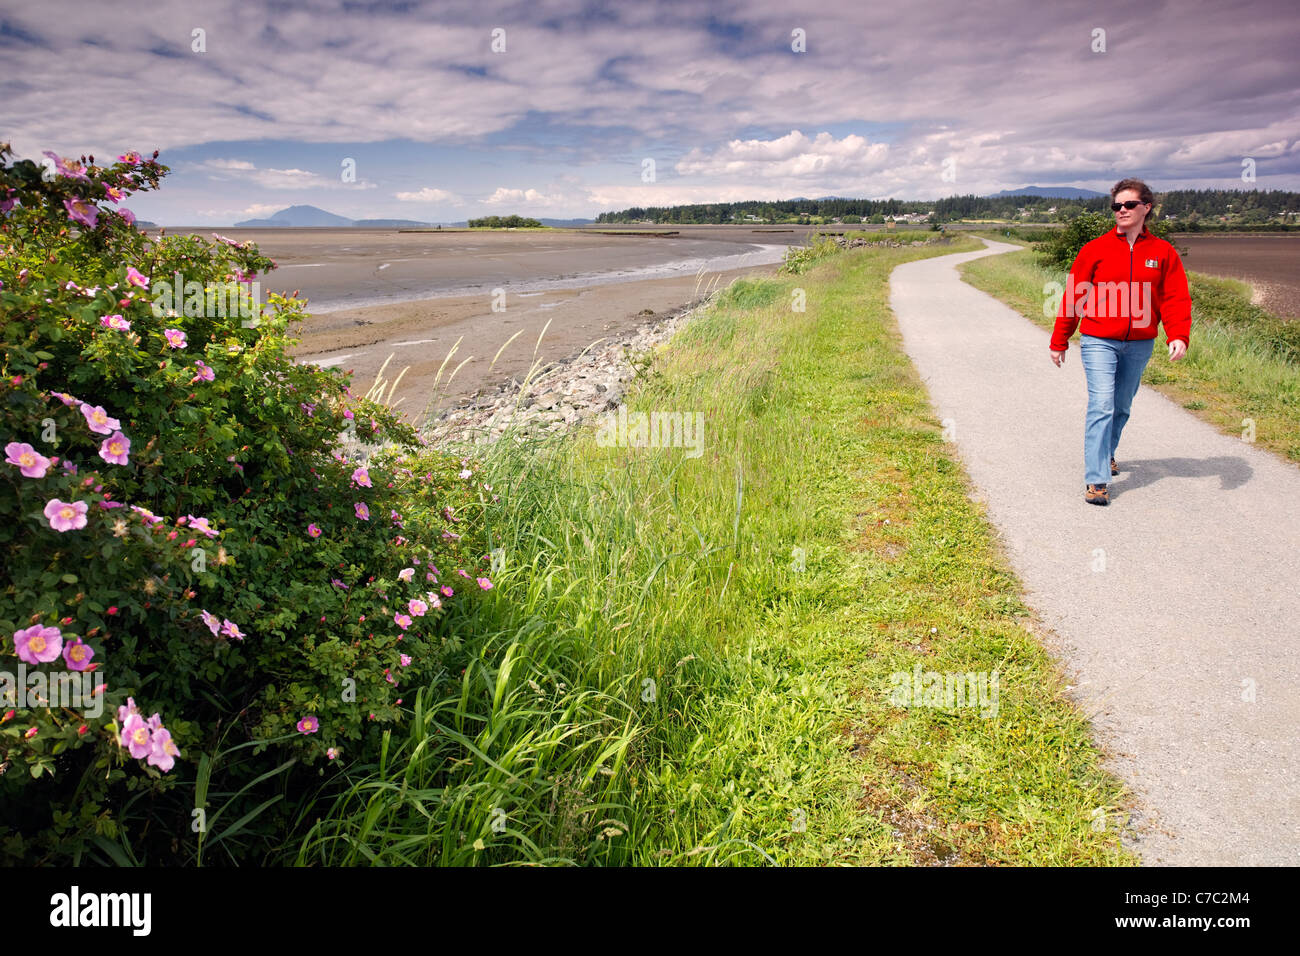 Woman walking on dike trail, Padilla Bay National Estuarine Research Reserve, Skagit County, Washington, USA - Stock Image